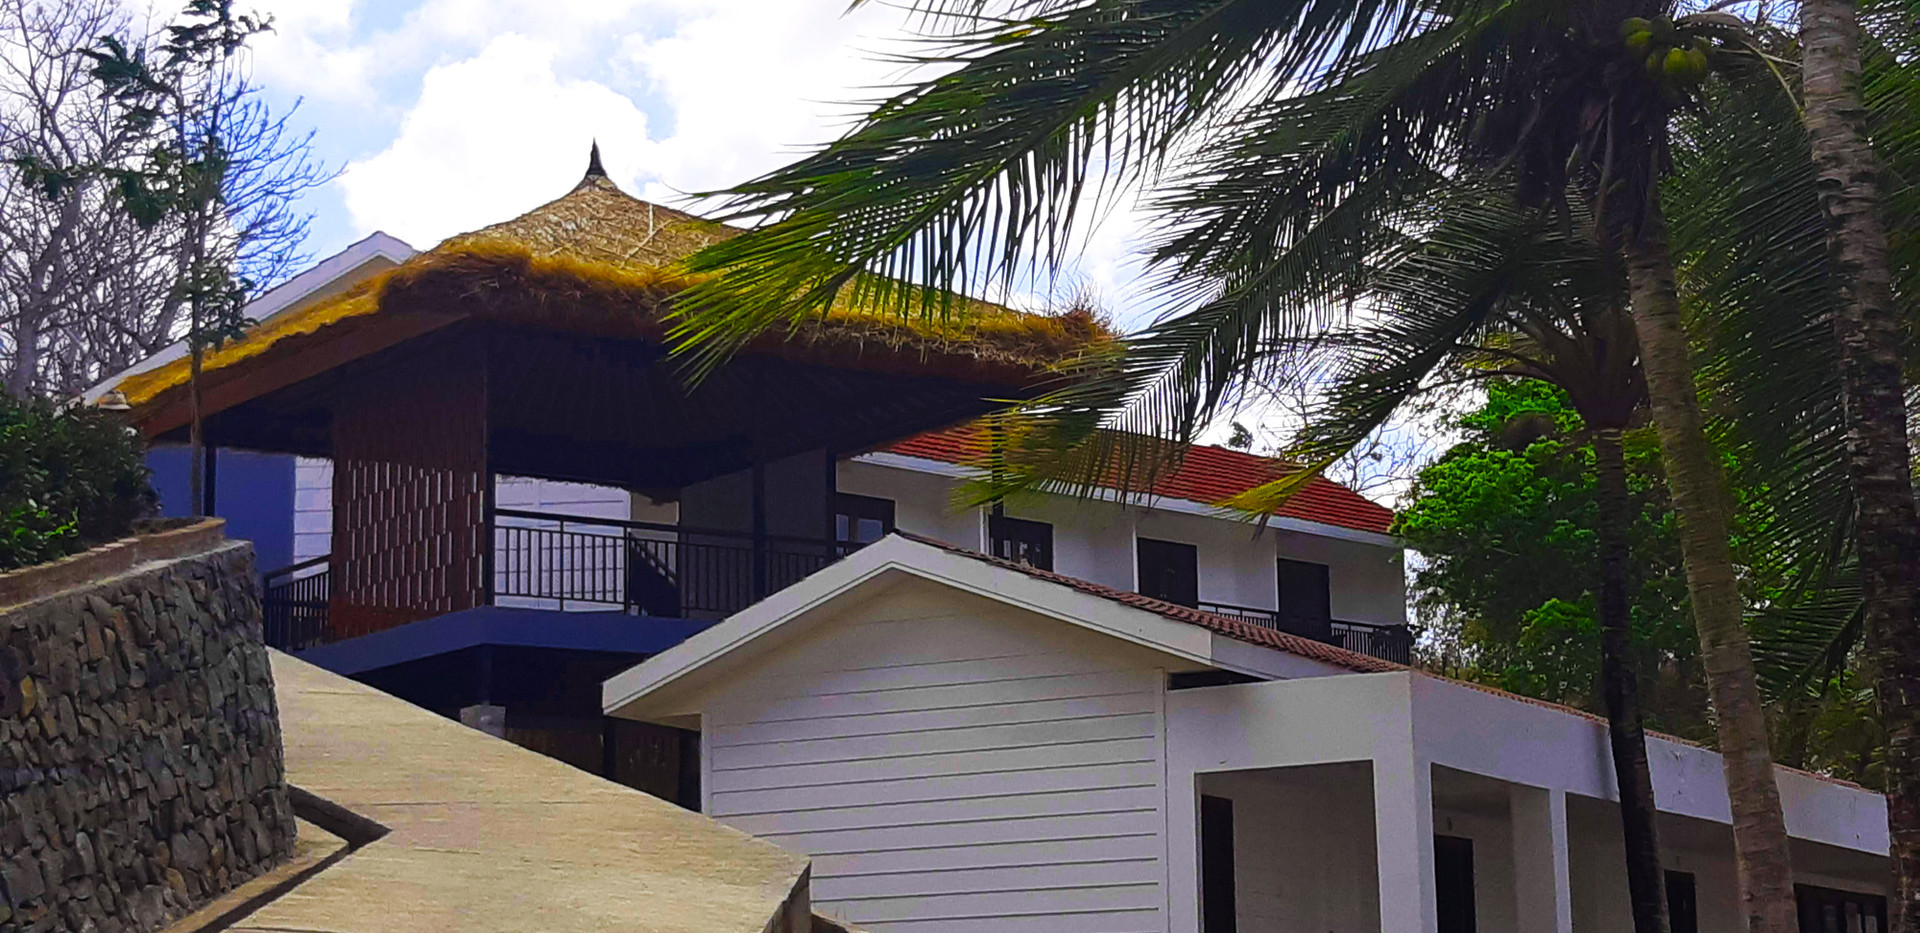 Marina Del Ray Hotel Port Gili Gede.jpg